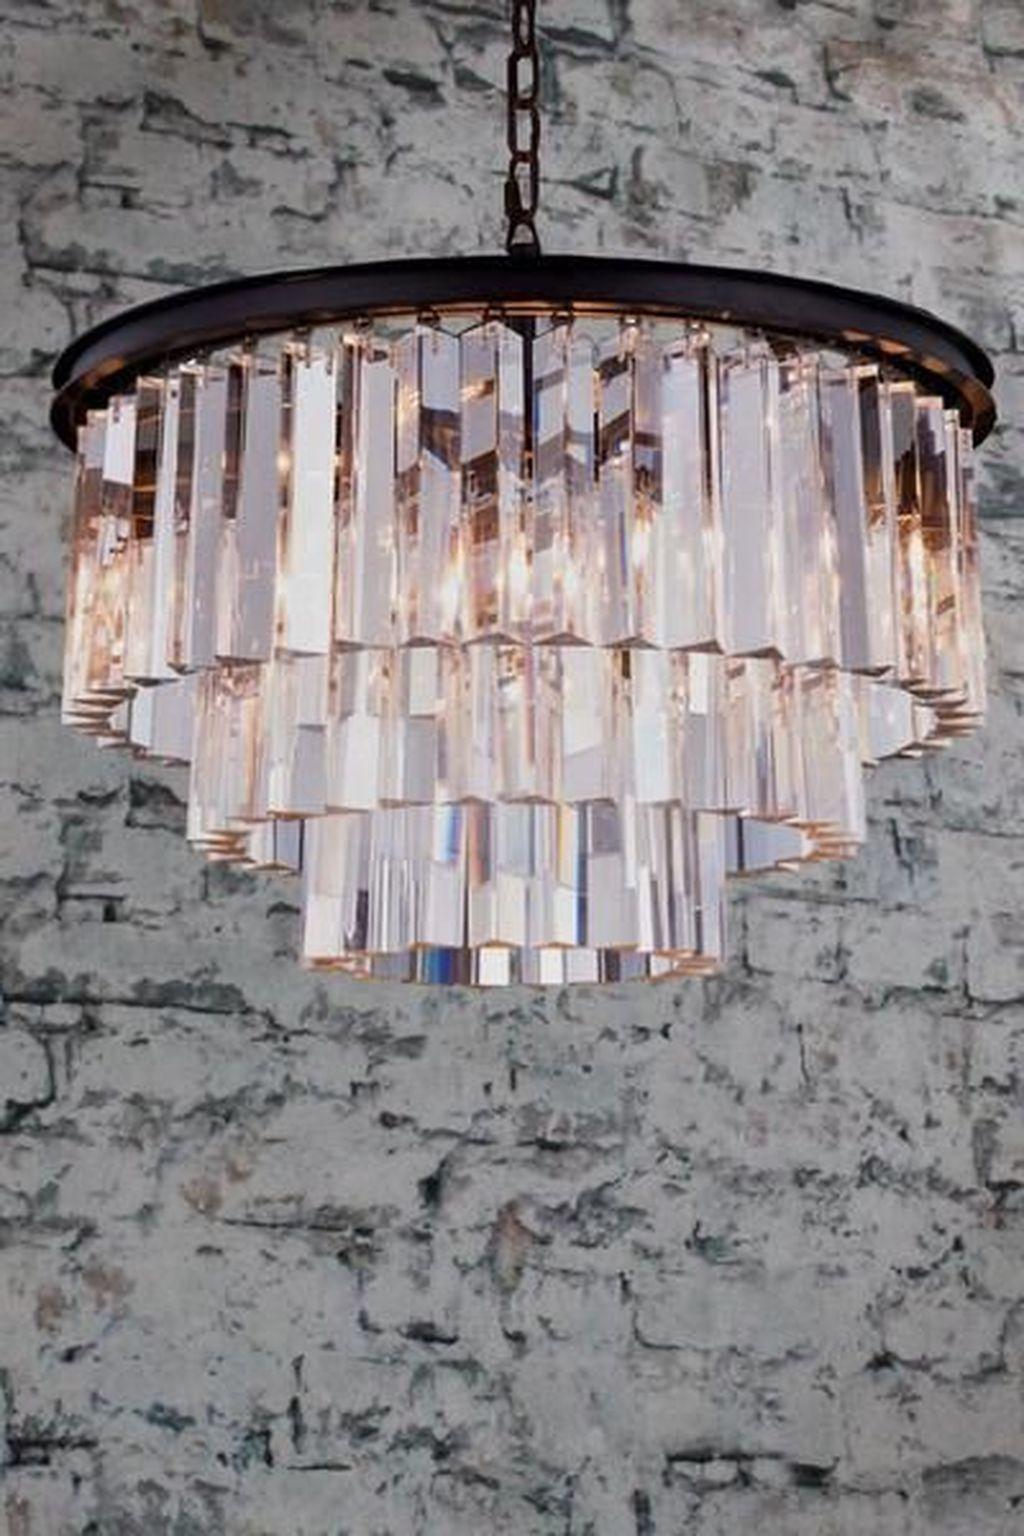 44 Beautiful Crystal Pendant Lighting Design Ideas Trendehouse Crystal Pendant Lighting Pendant Lighting Light Art